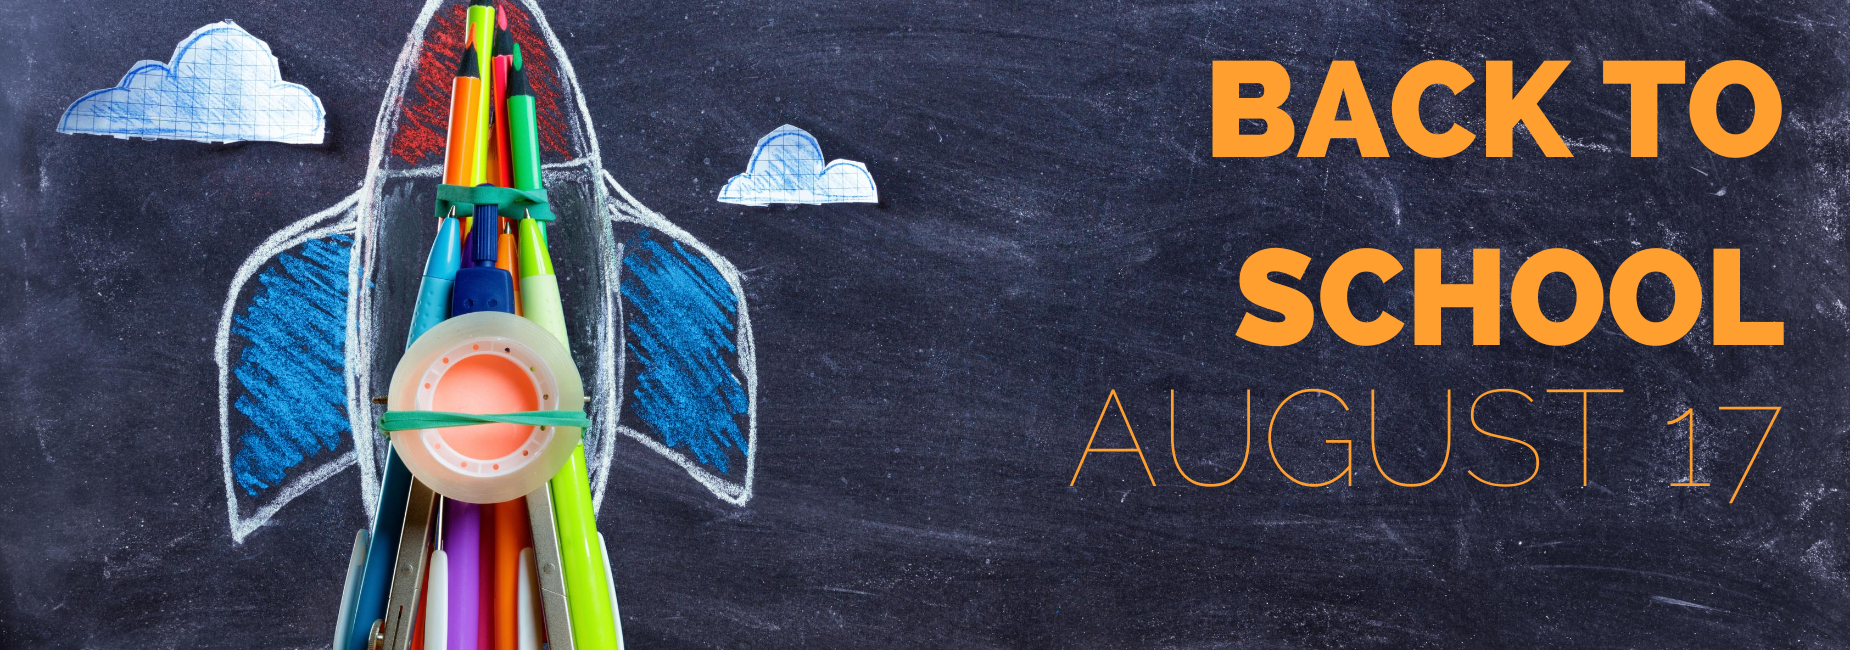 chalkboard with rocket & back to school August 17